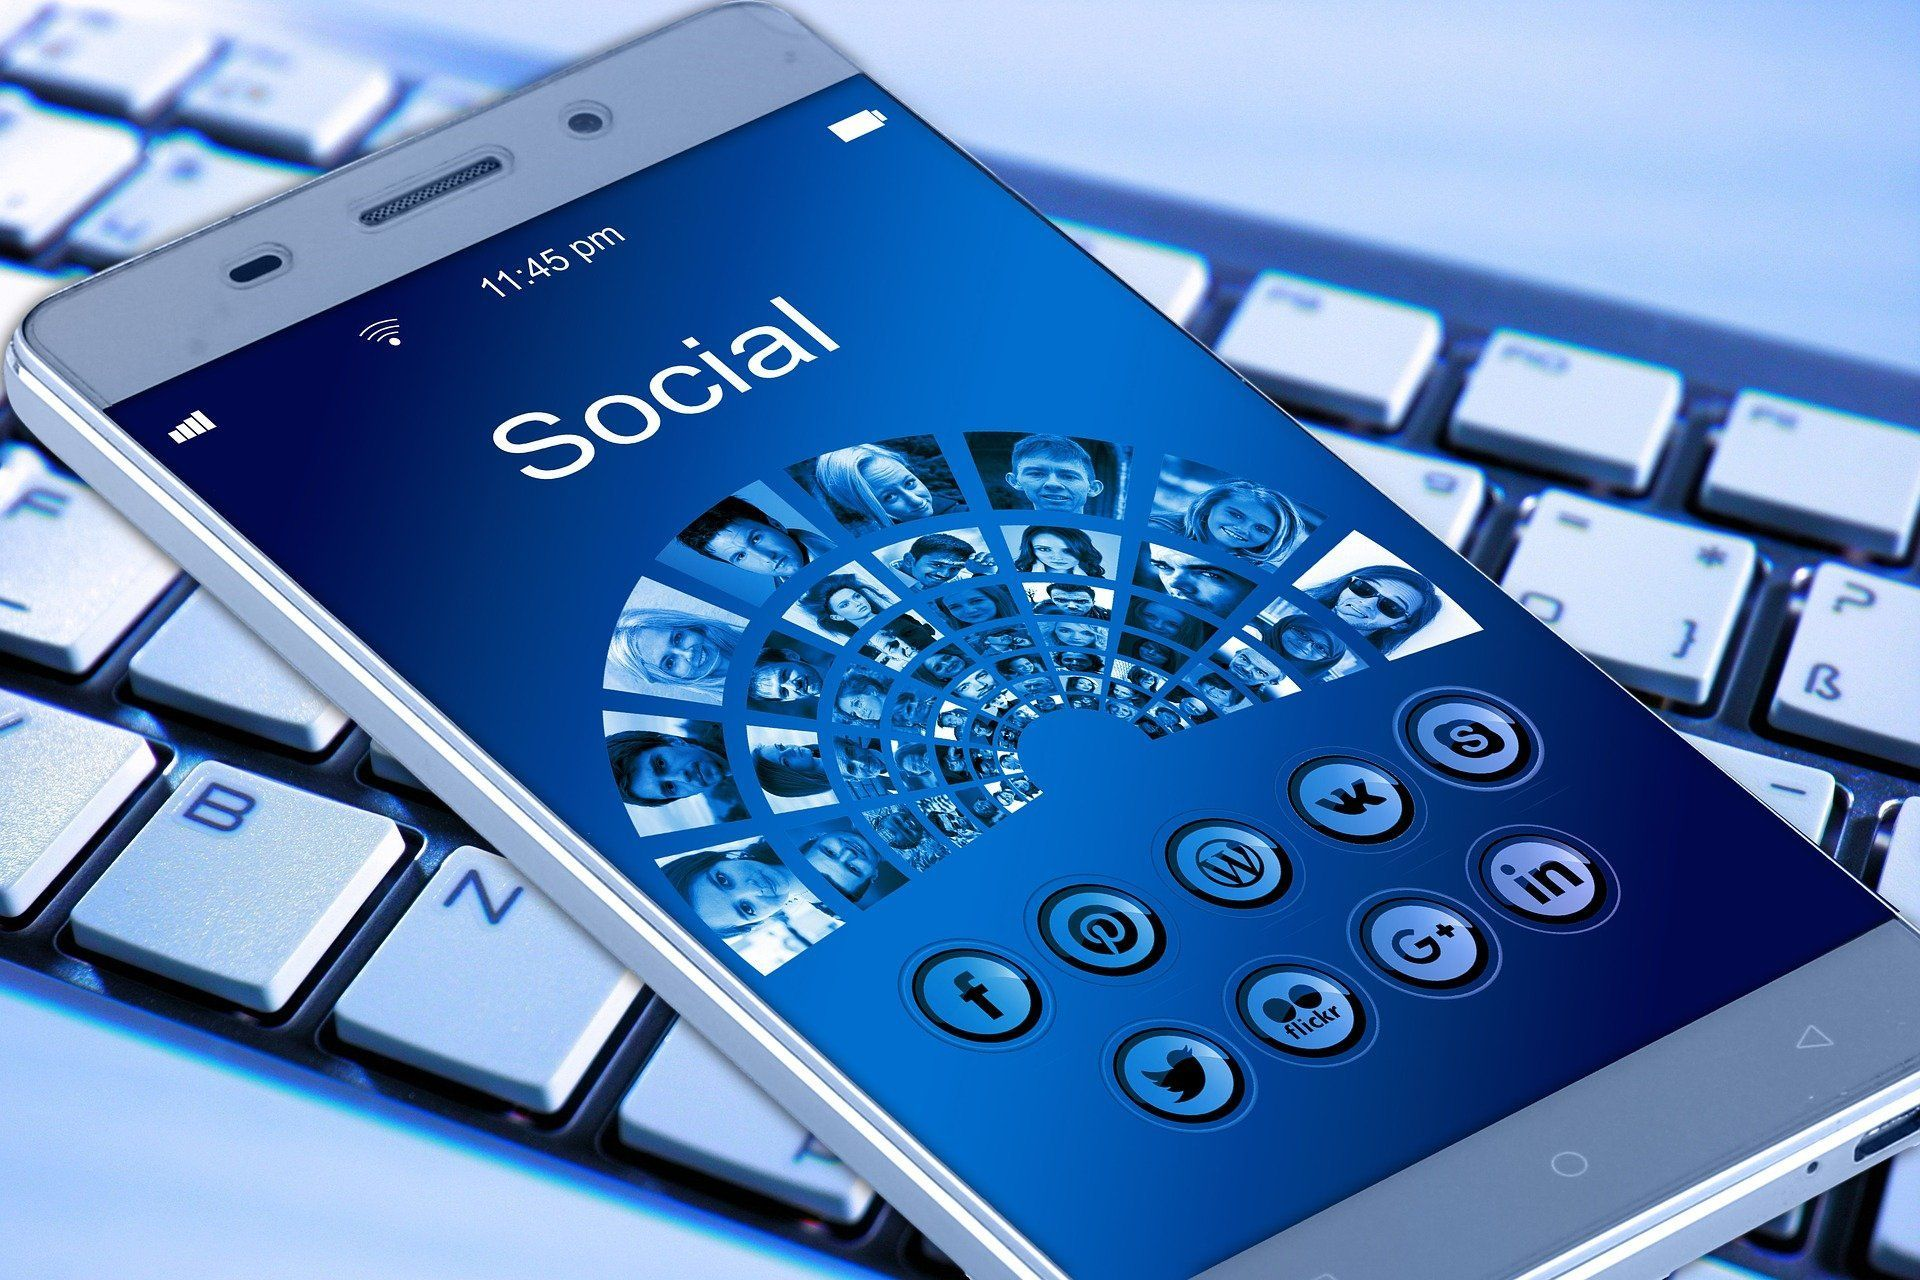 SOCIAL MEDIA MANAGEMENT - Social Media Management